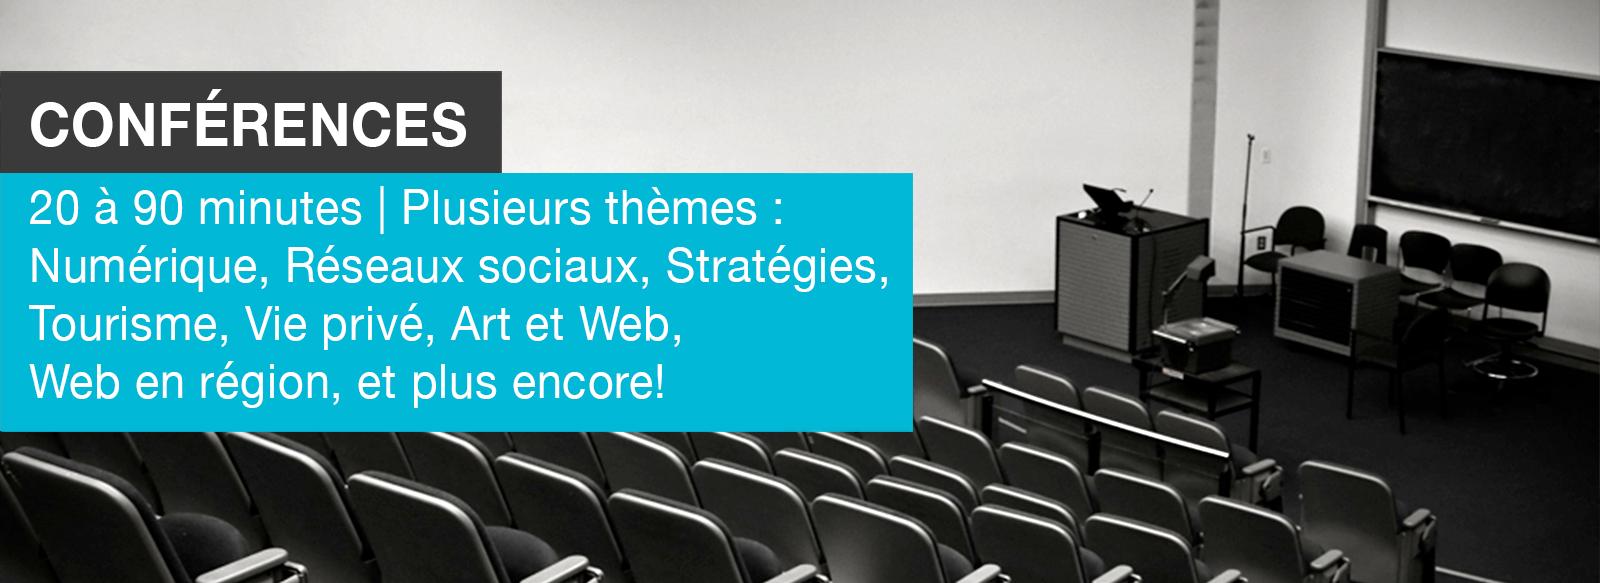 Edith Jolicoeur, Consultante branchée | Conférences